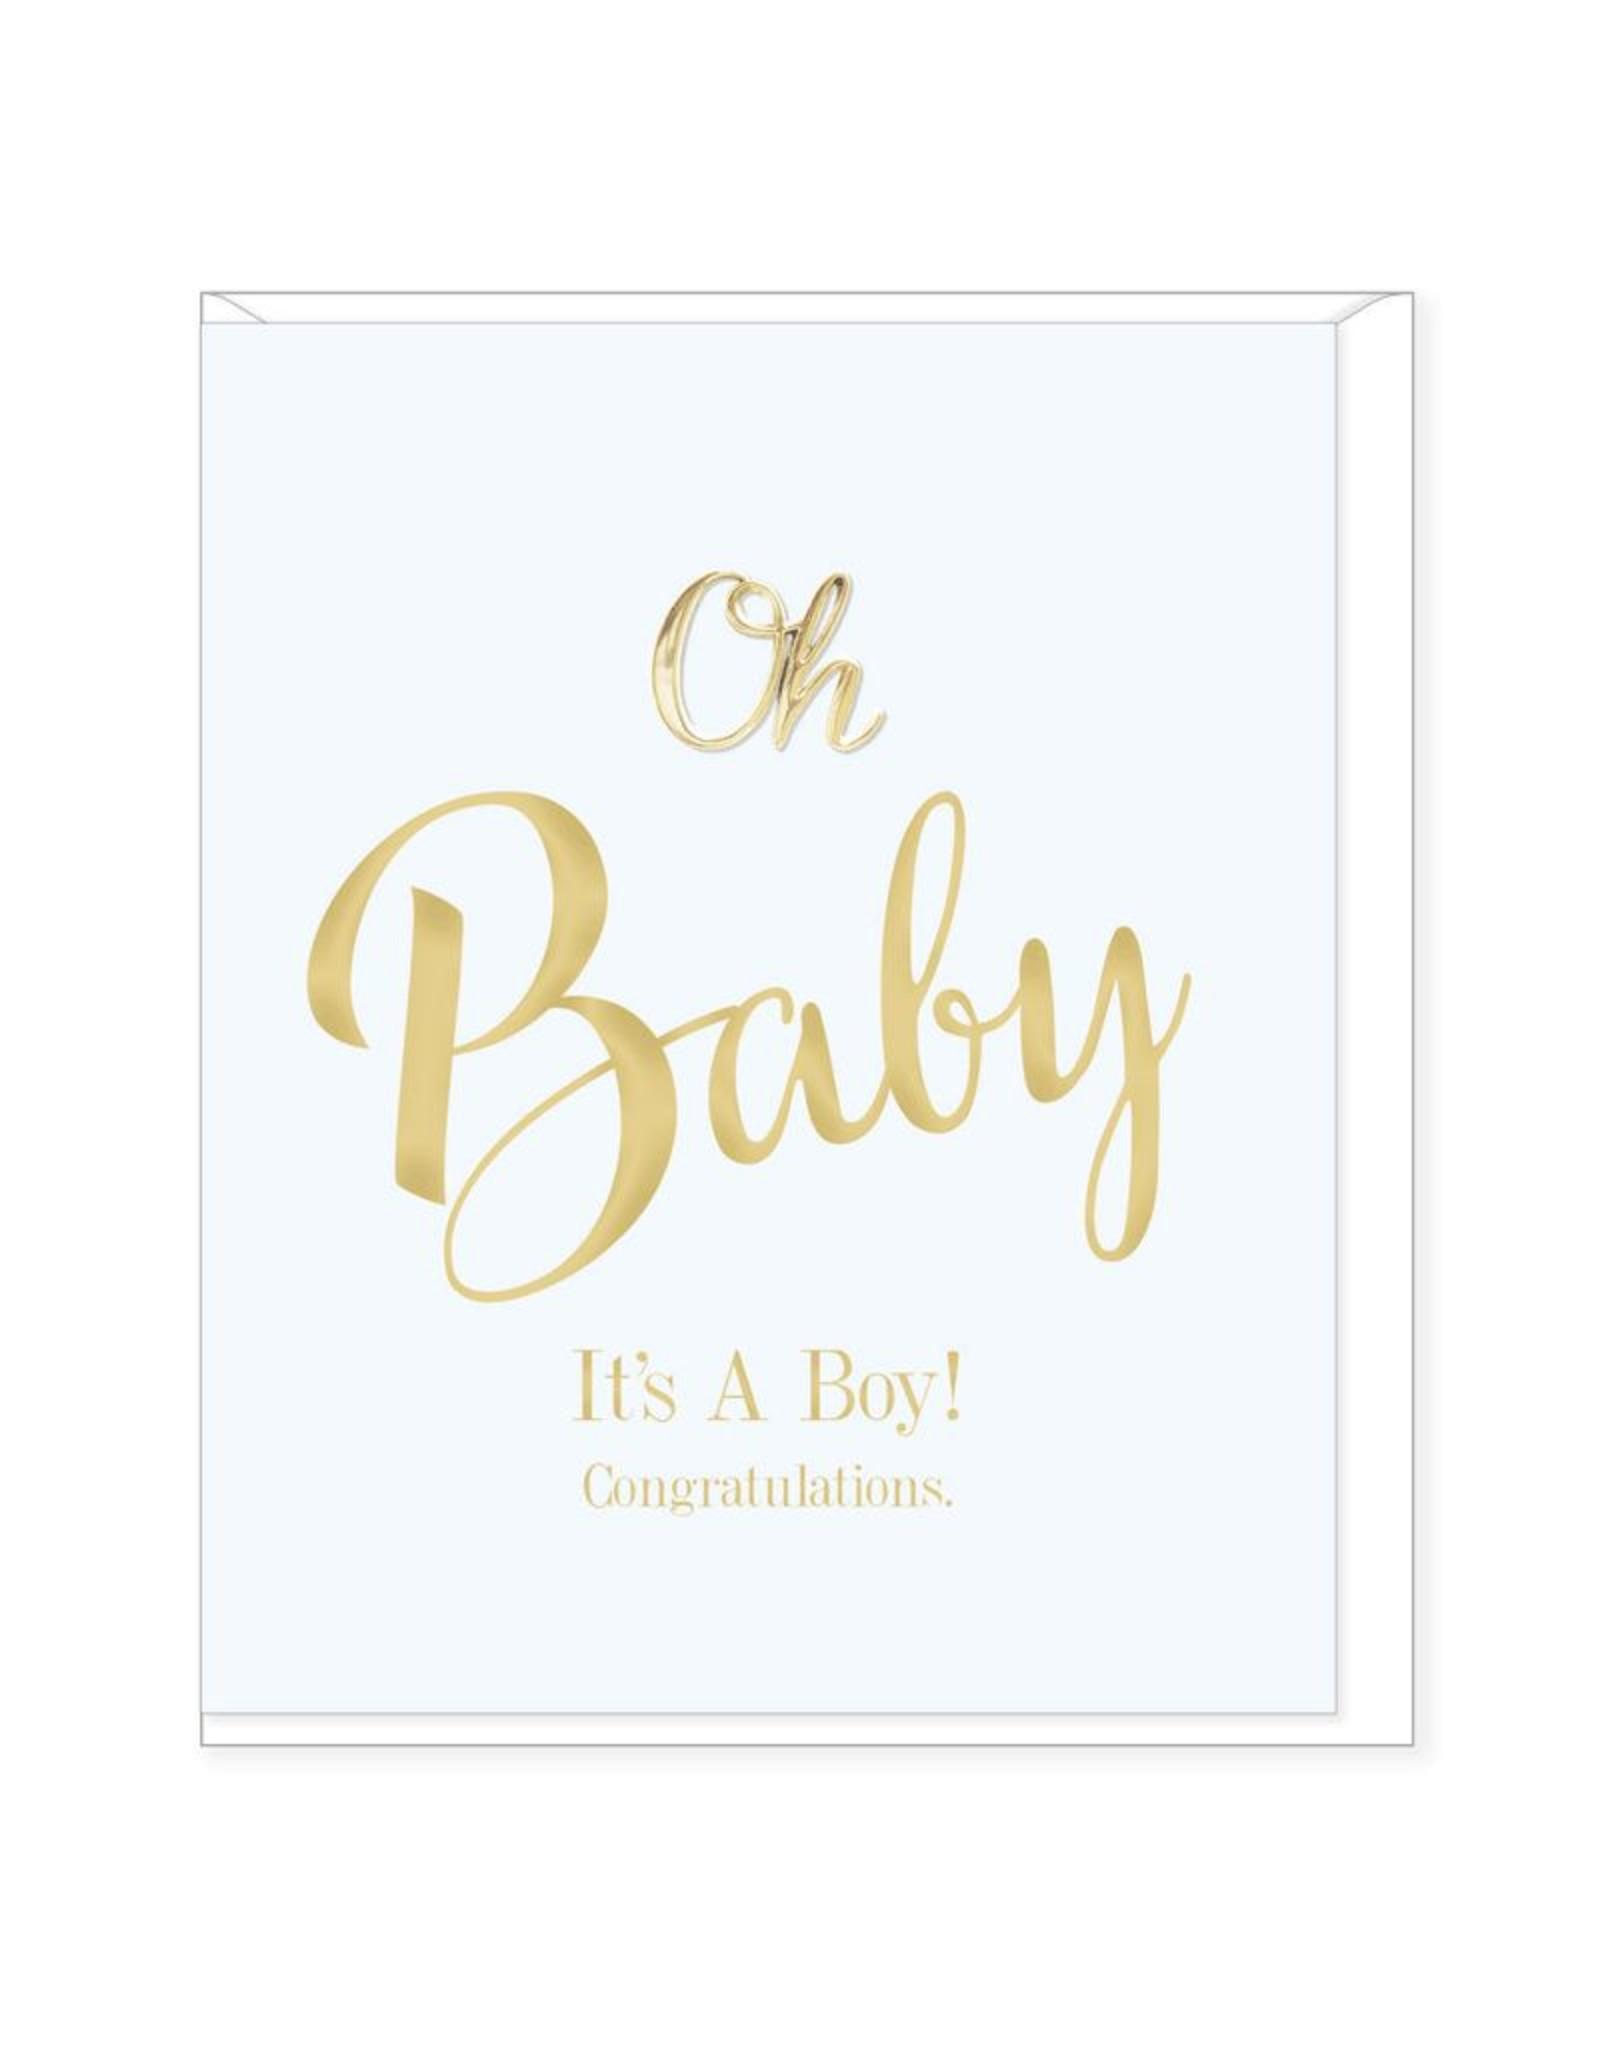 Hearts Design Wenskaart - Oh Baby, it's a Boy!